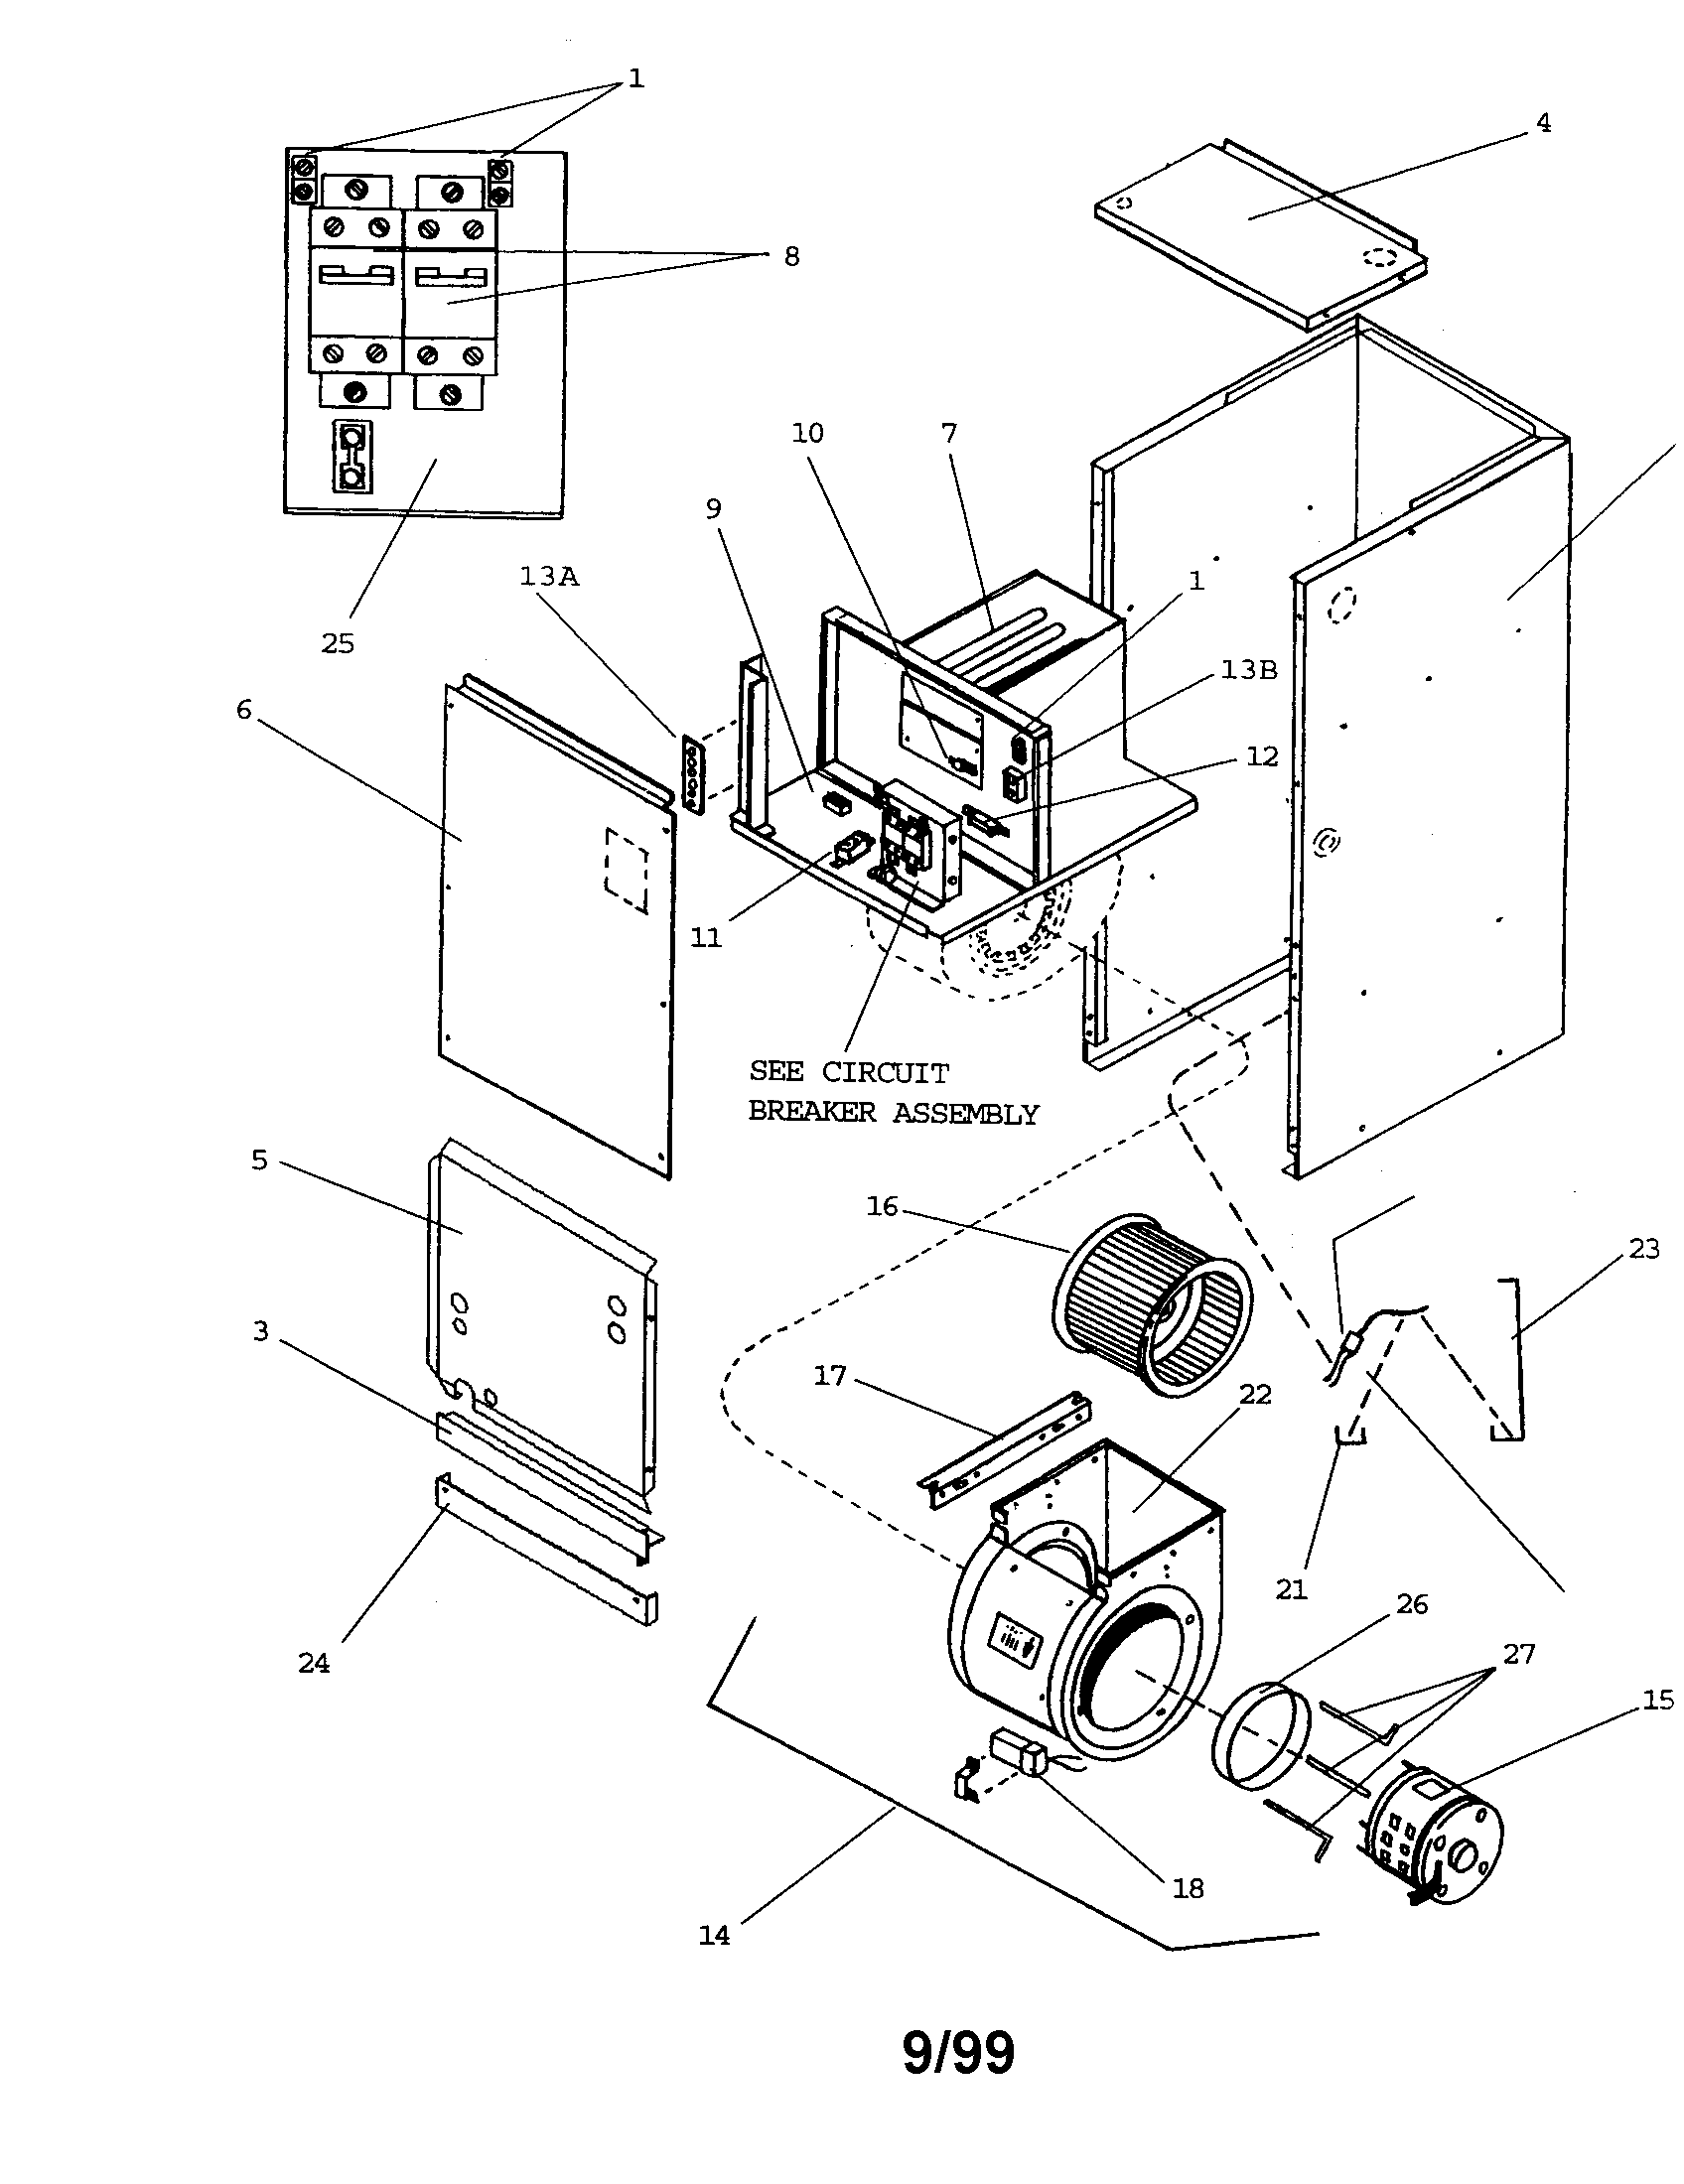 hight resolution of goodman air handler parts diagram wiring diagrams for trane air handler parts diagram air handler parts diagram